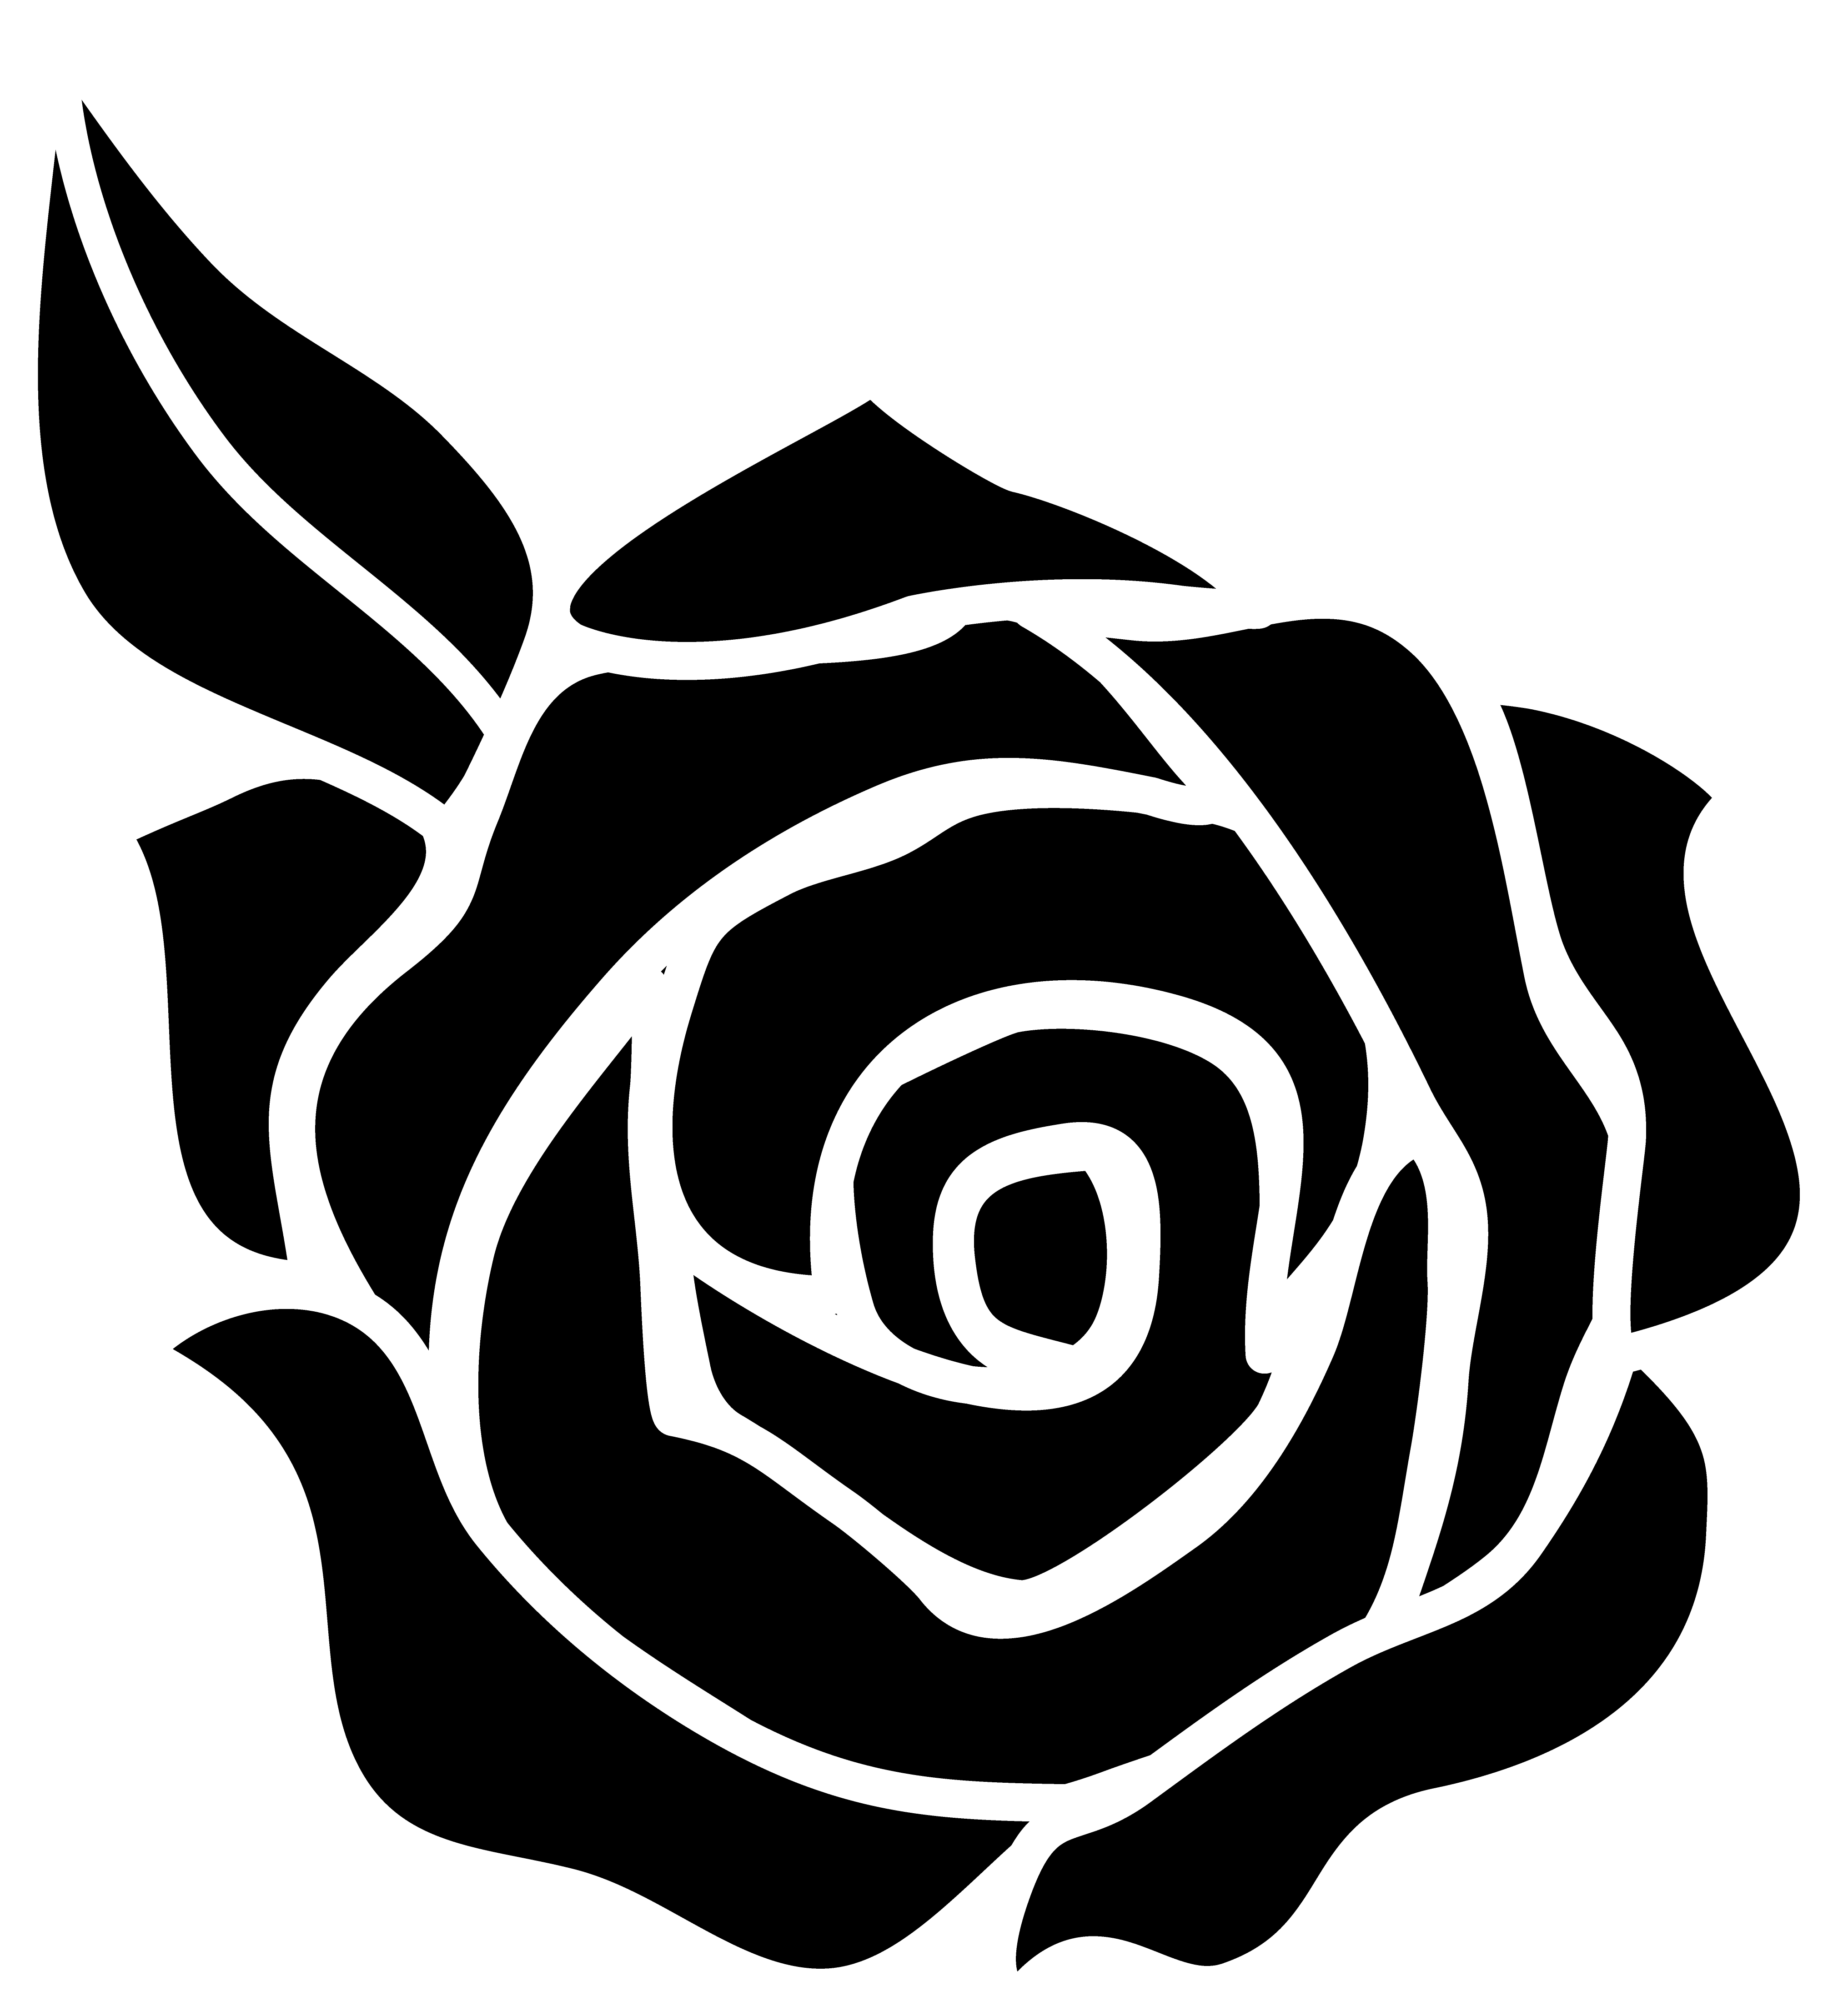 White Rose clipart silhouette Sticker Google leaf) Image Rose